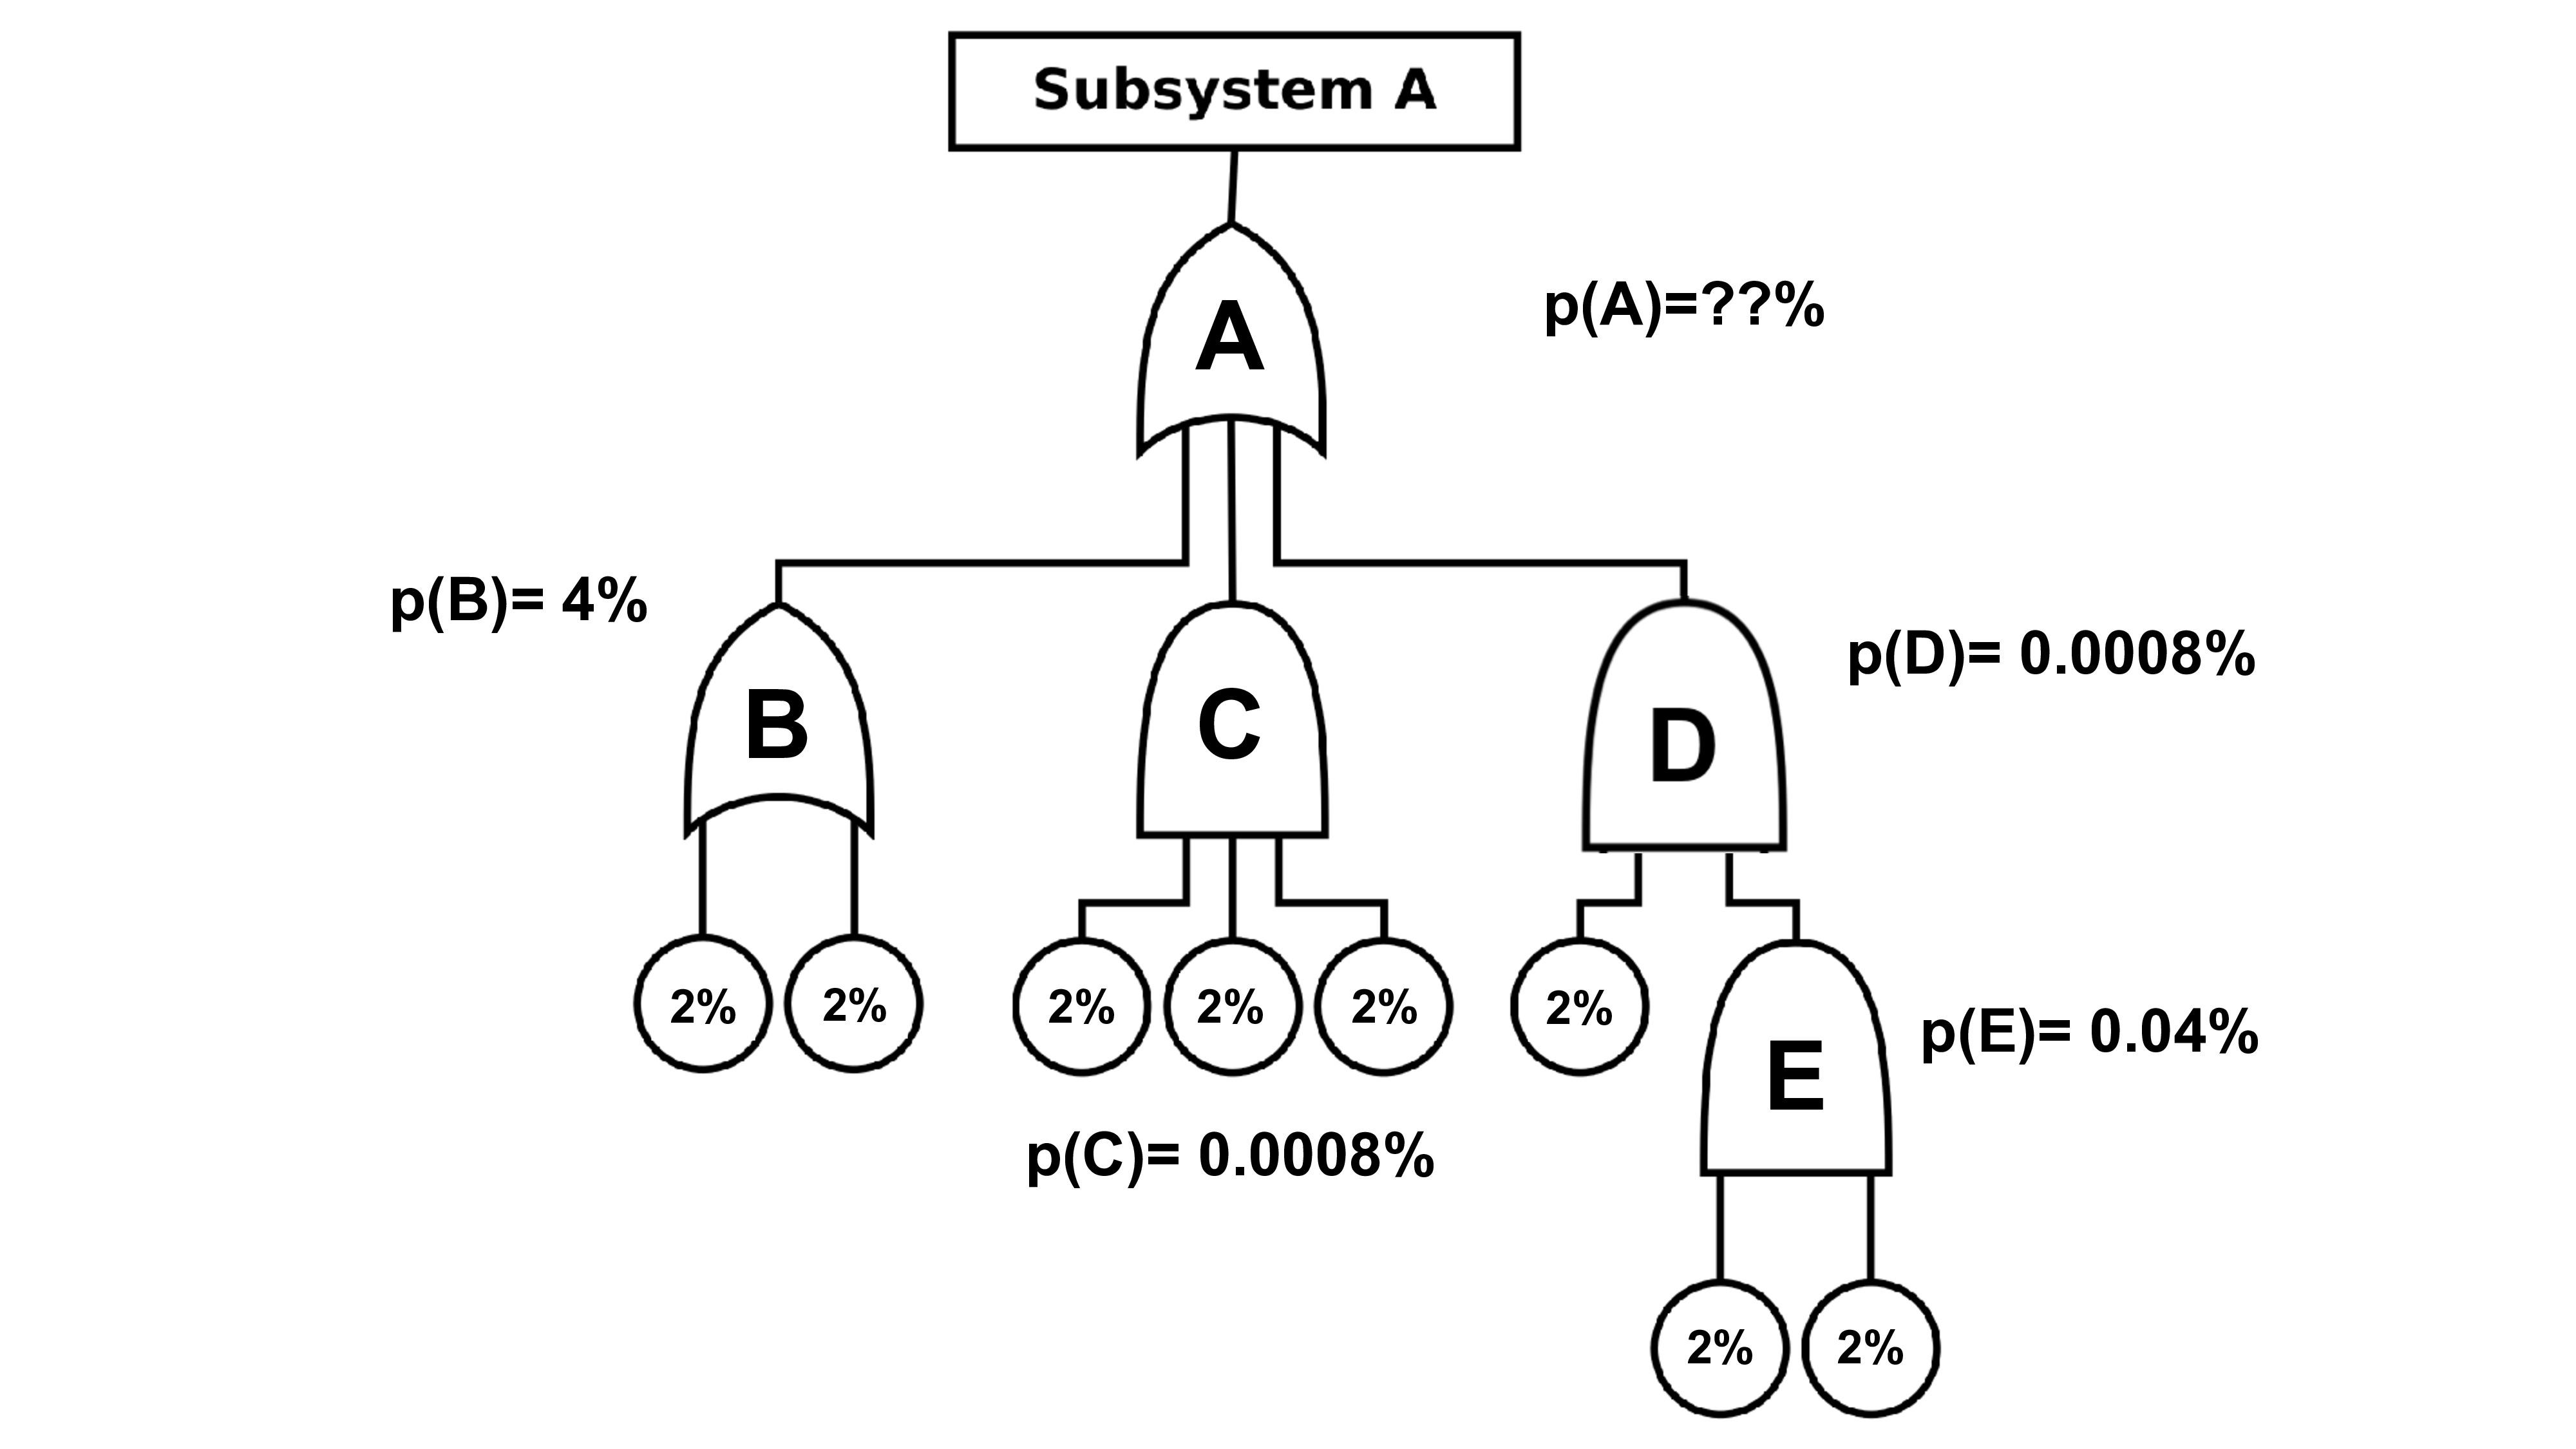 A B C D E p(E)= 0.04% p(D)= 0.0008% 2% 2% 2% 2%...